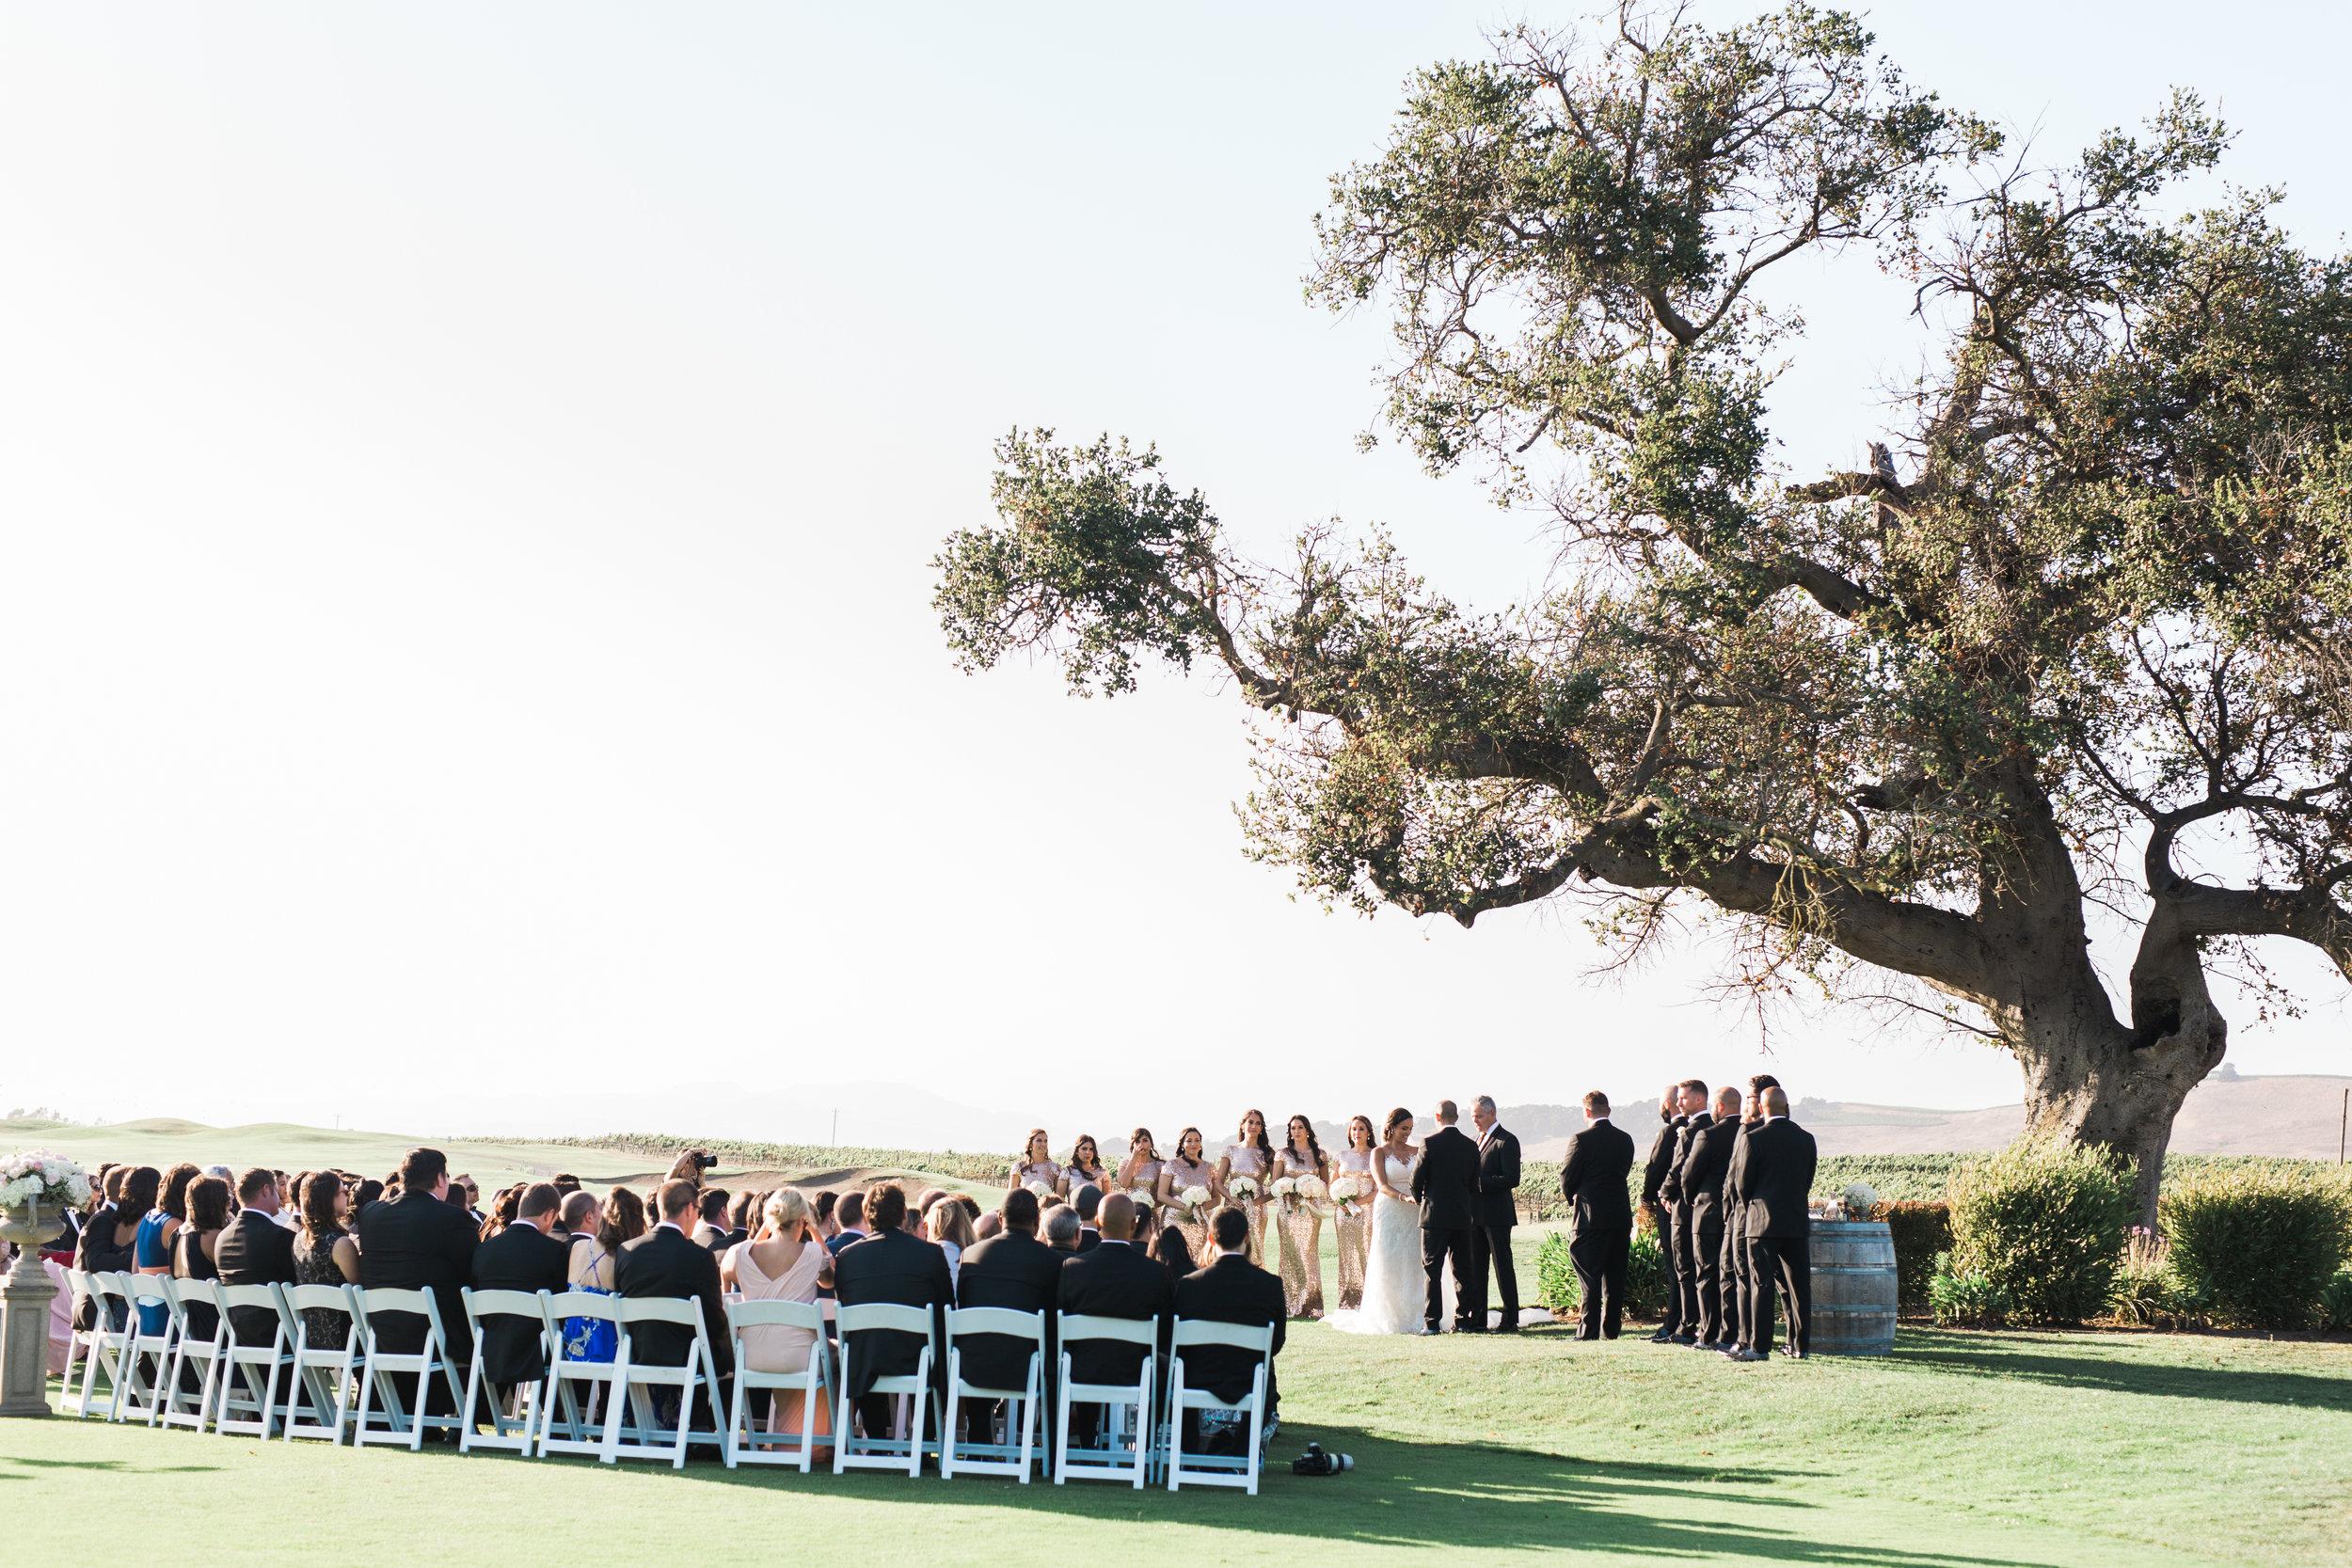 jenny-and-george-wedding-roque-events-meyerott-photography 785.jpg